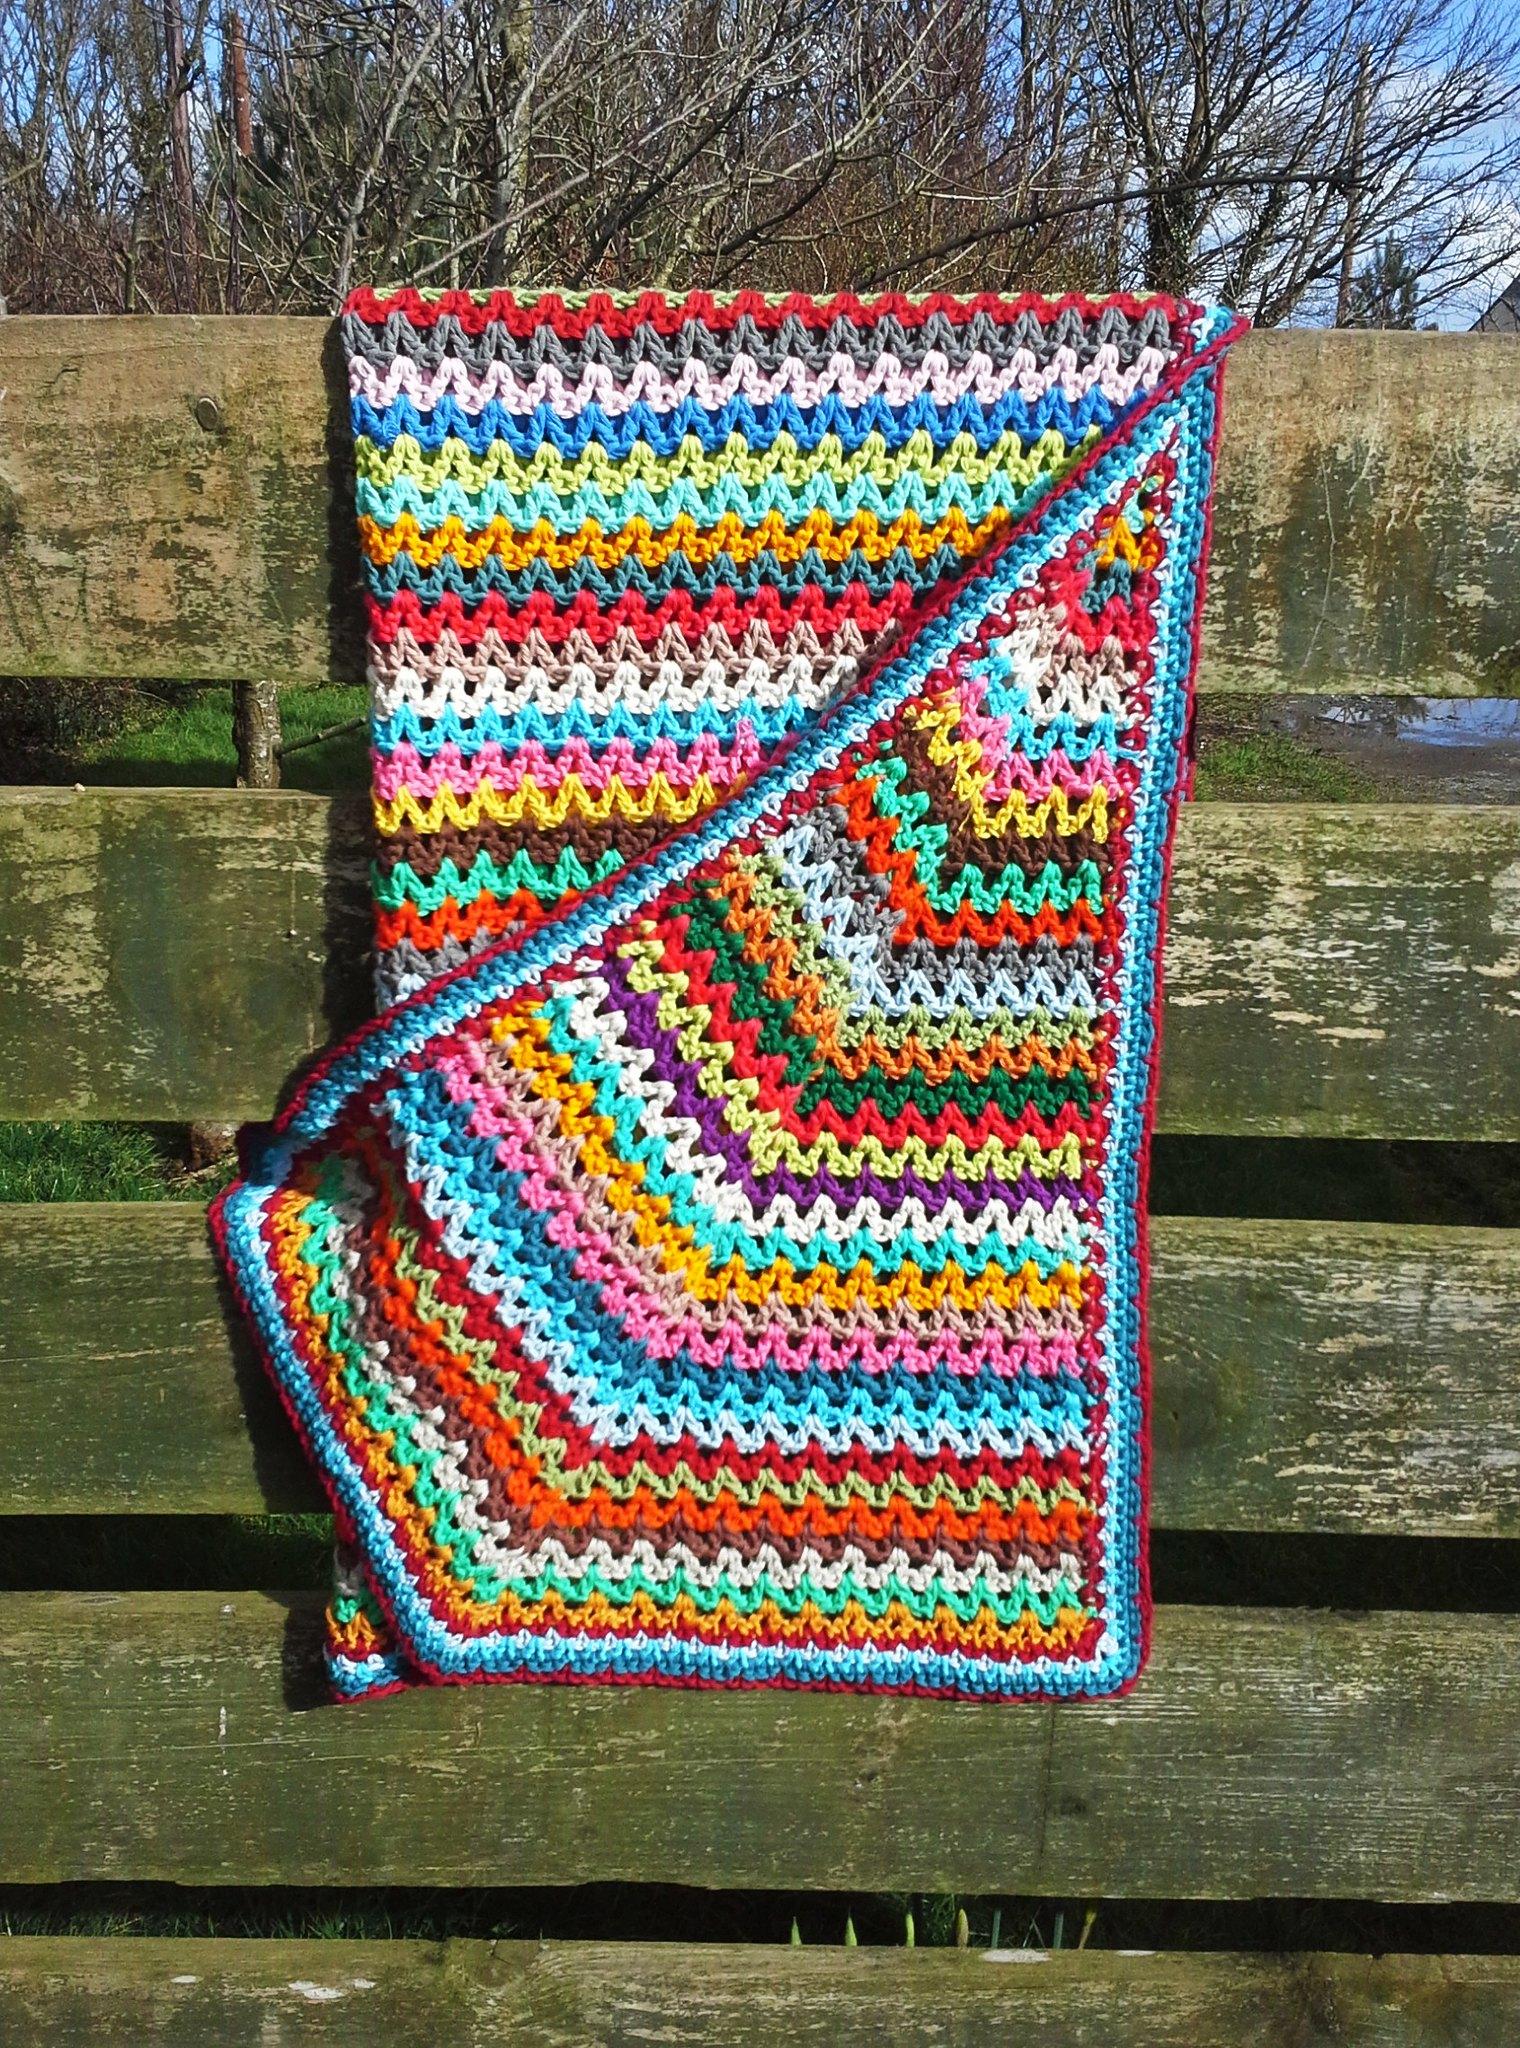 Crochet Scrap Yarn Blanket Explore Anniedesign S Photos